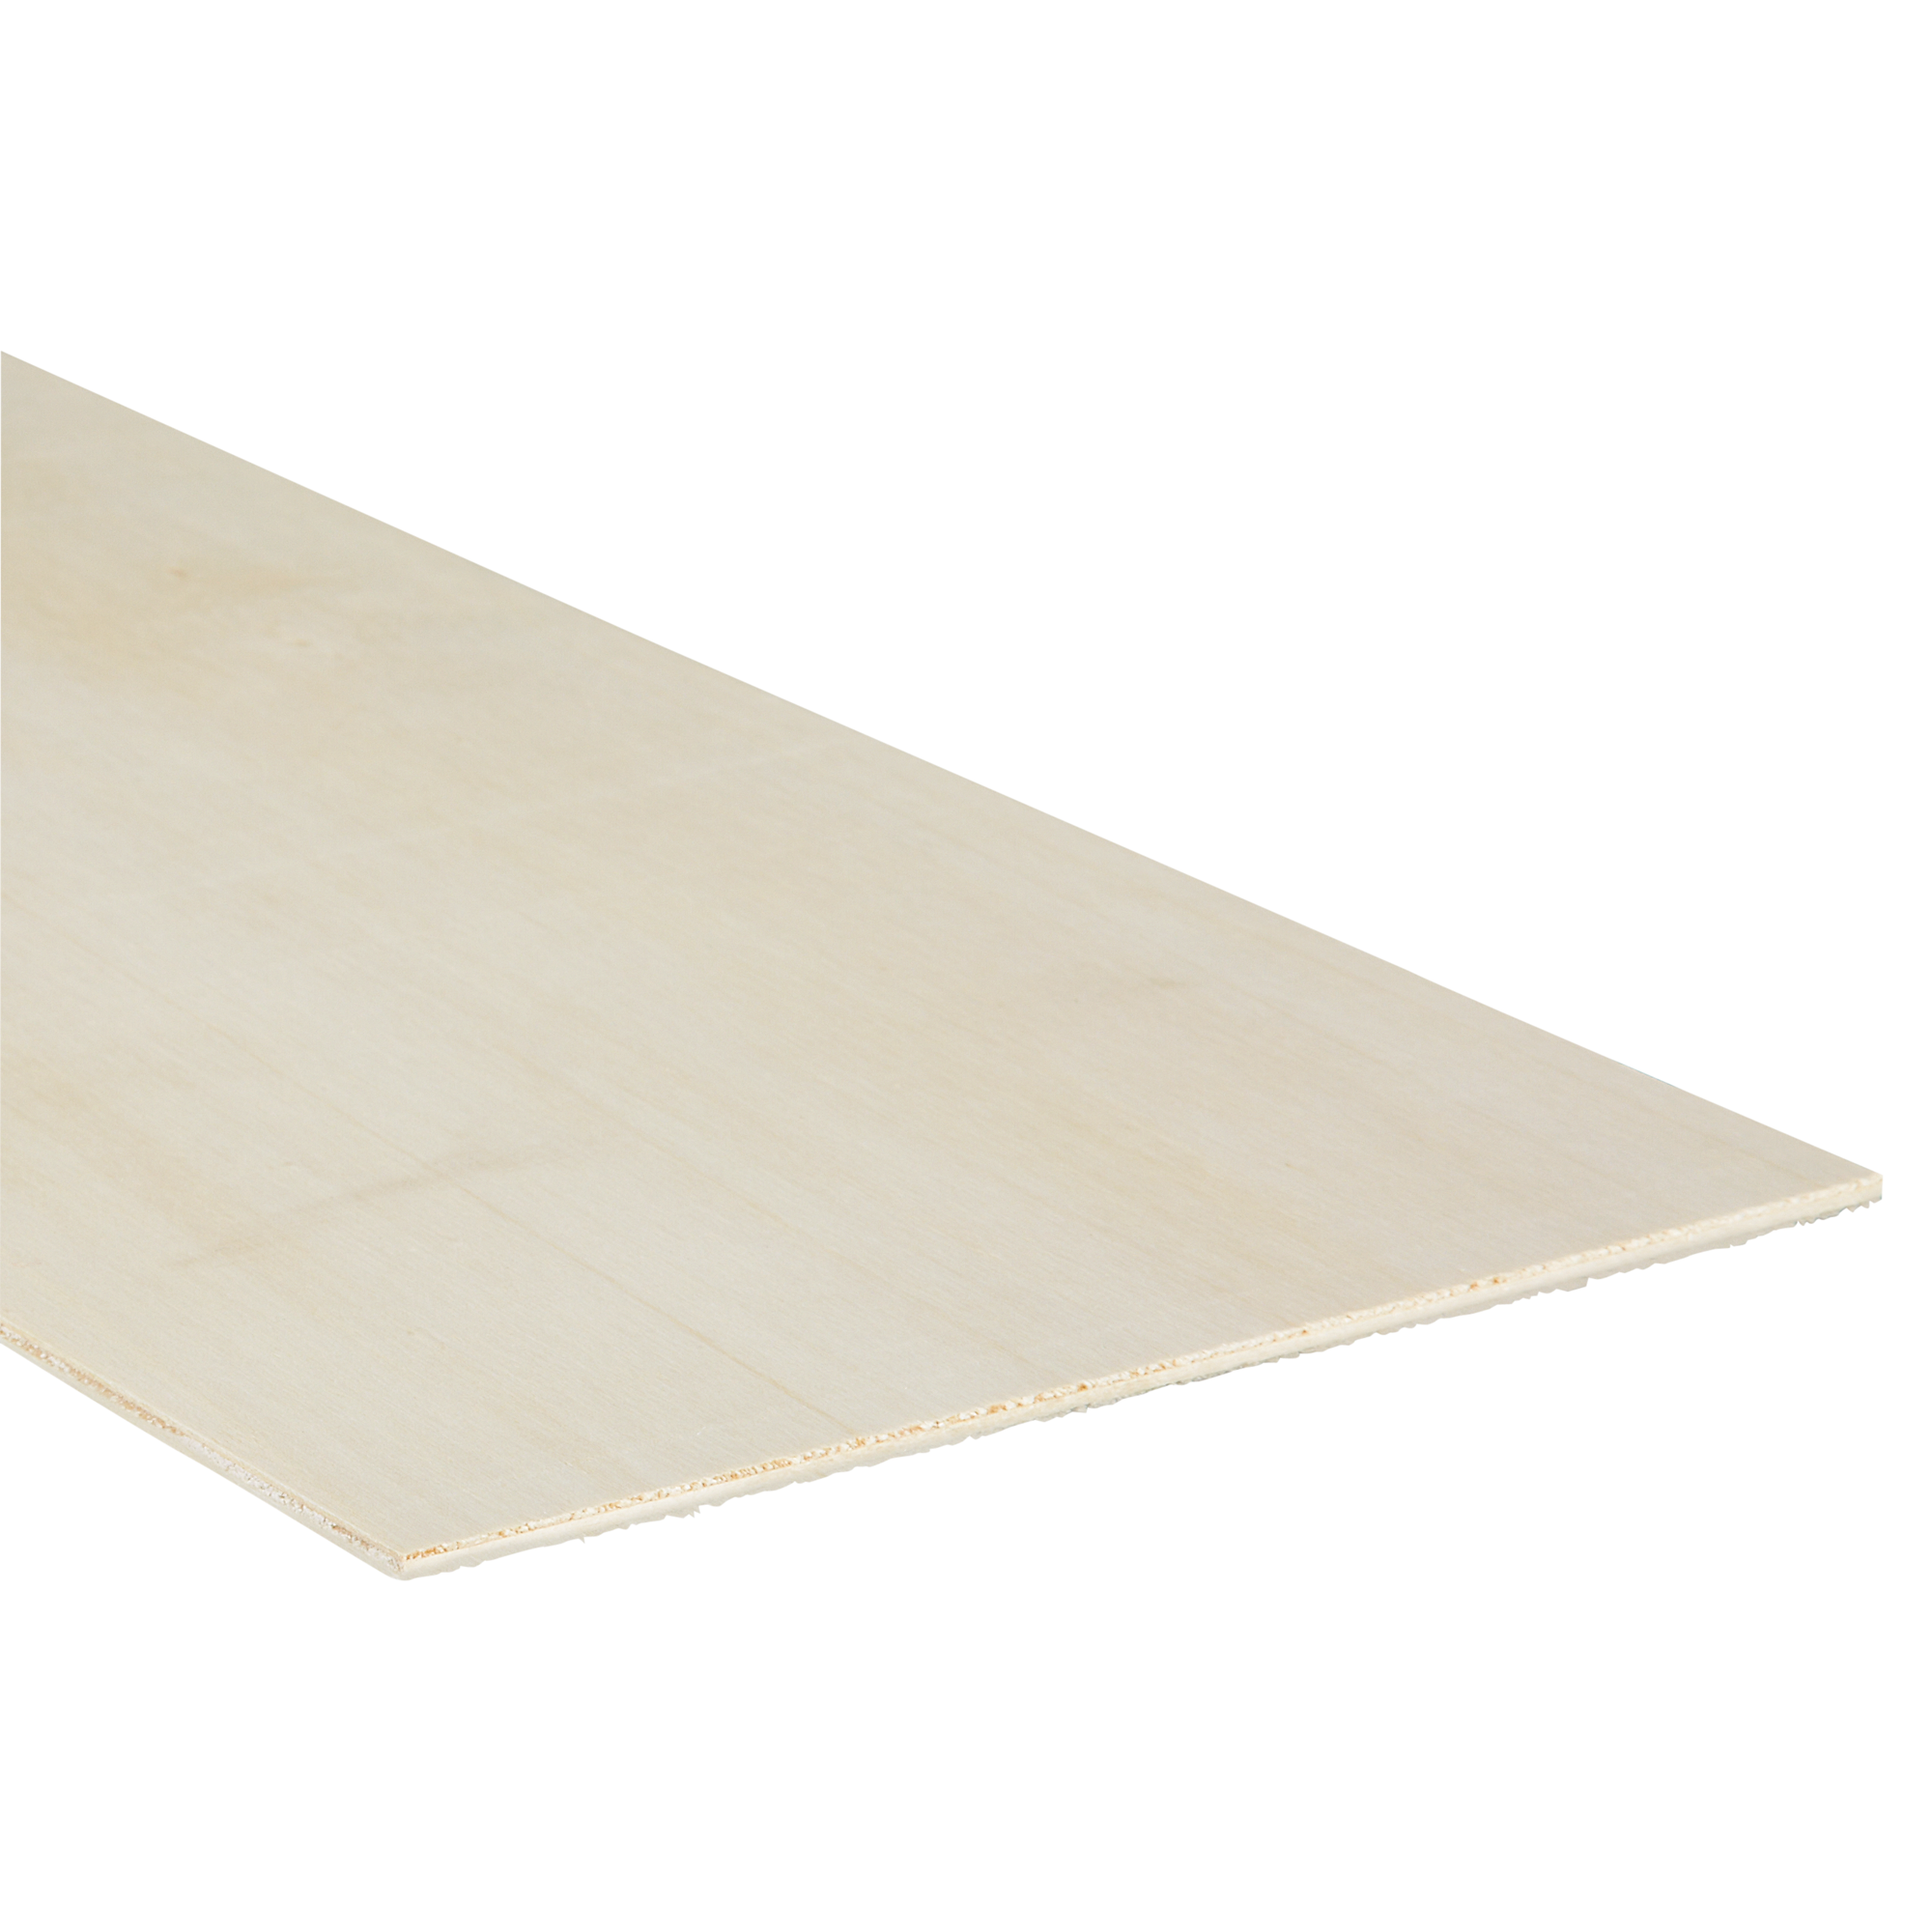 Sperrholz M/öbelbau Pappel 400 x 400 x 4 mm